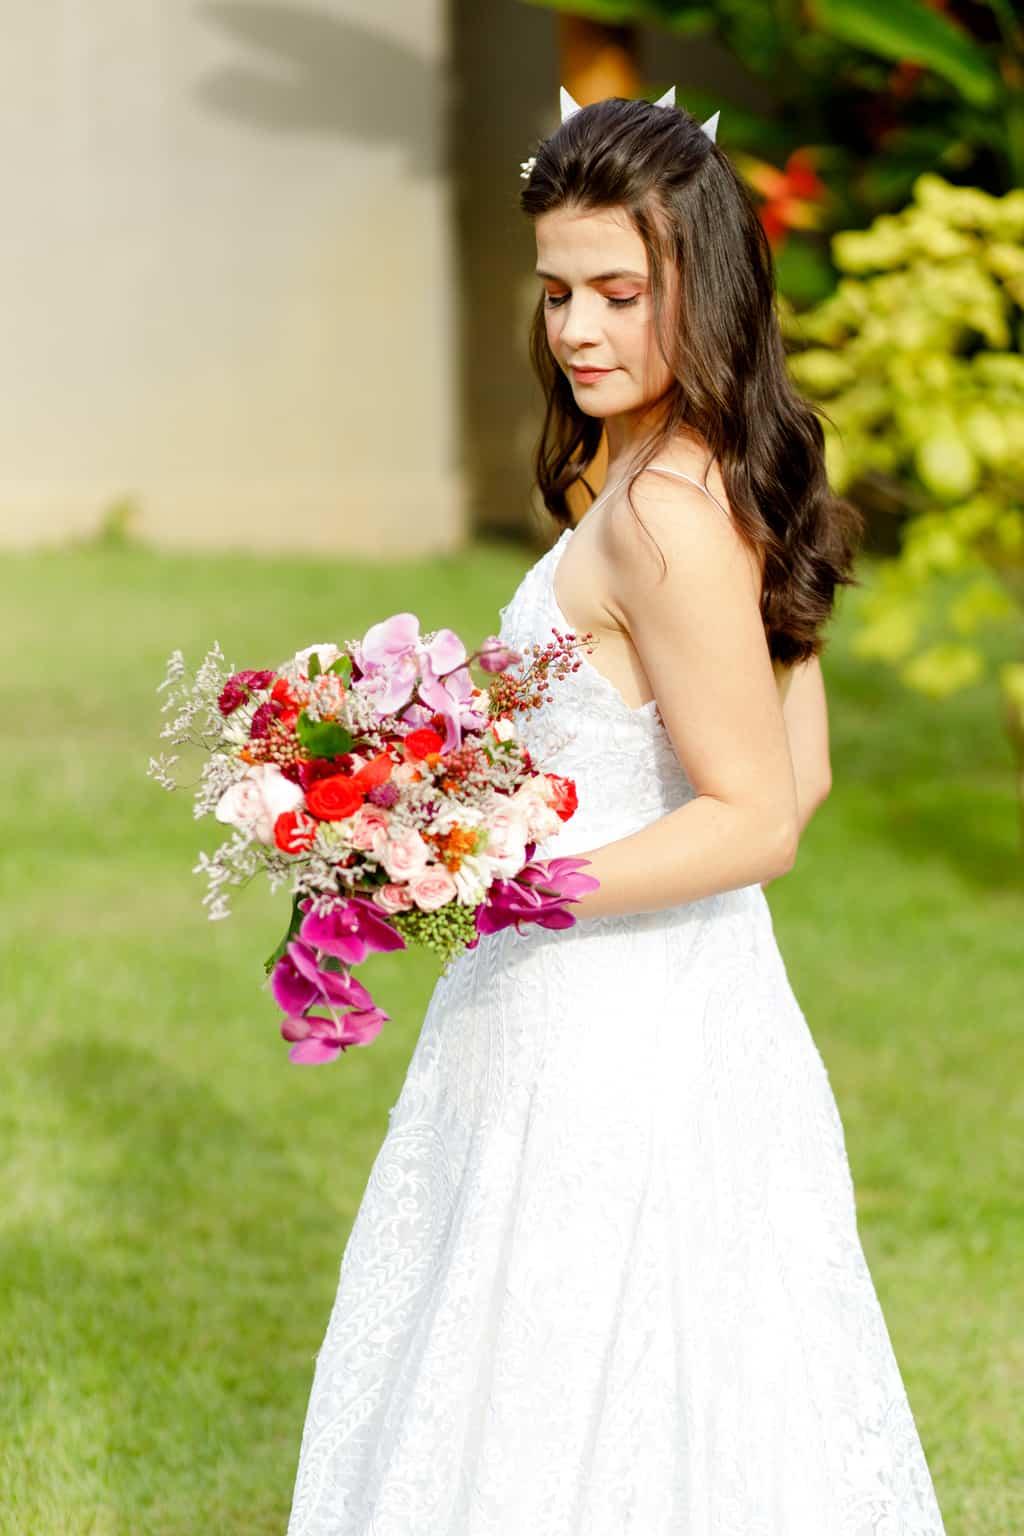 Casamento-Emanuelle-e-Alysson-Fotografia-Tadeu-Nanó-e-Luca-Antunes-483